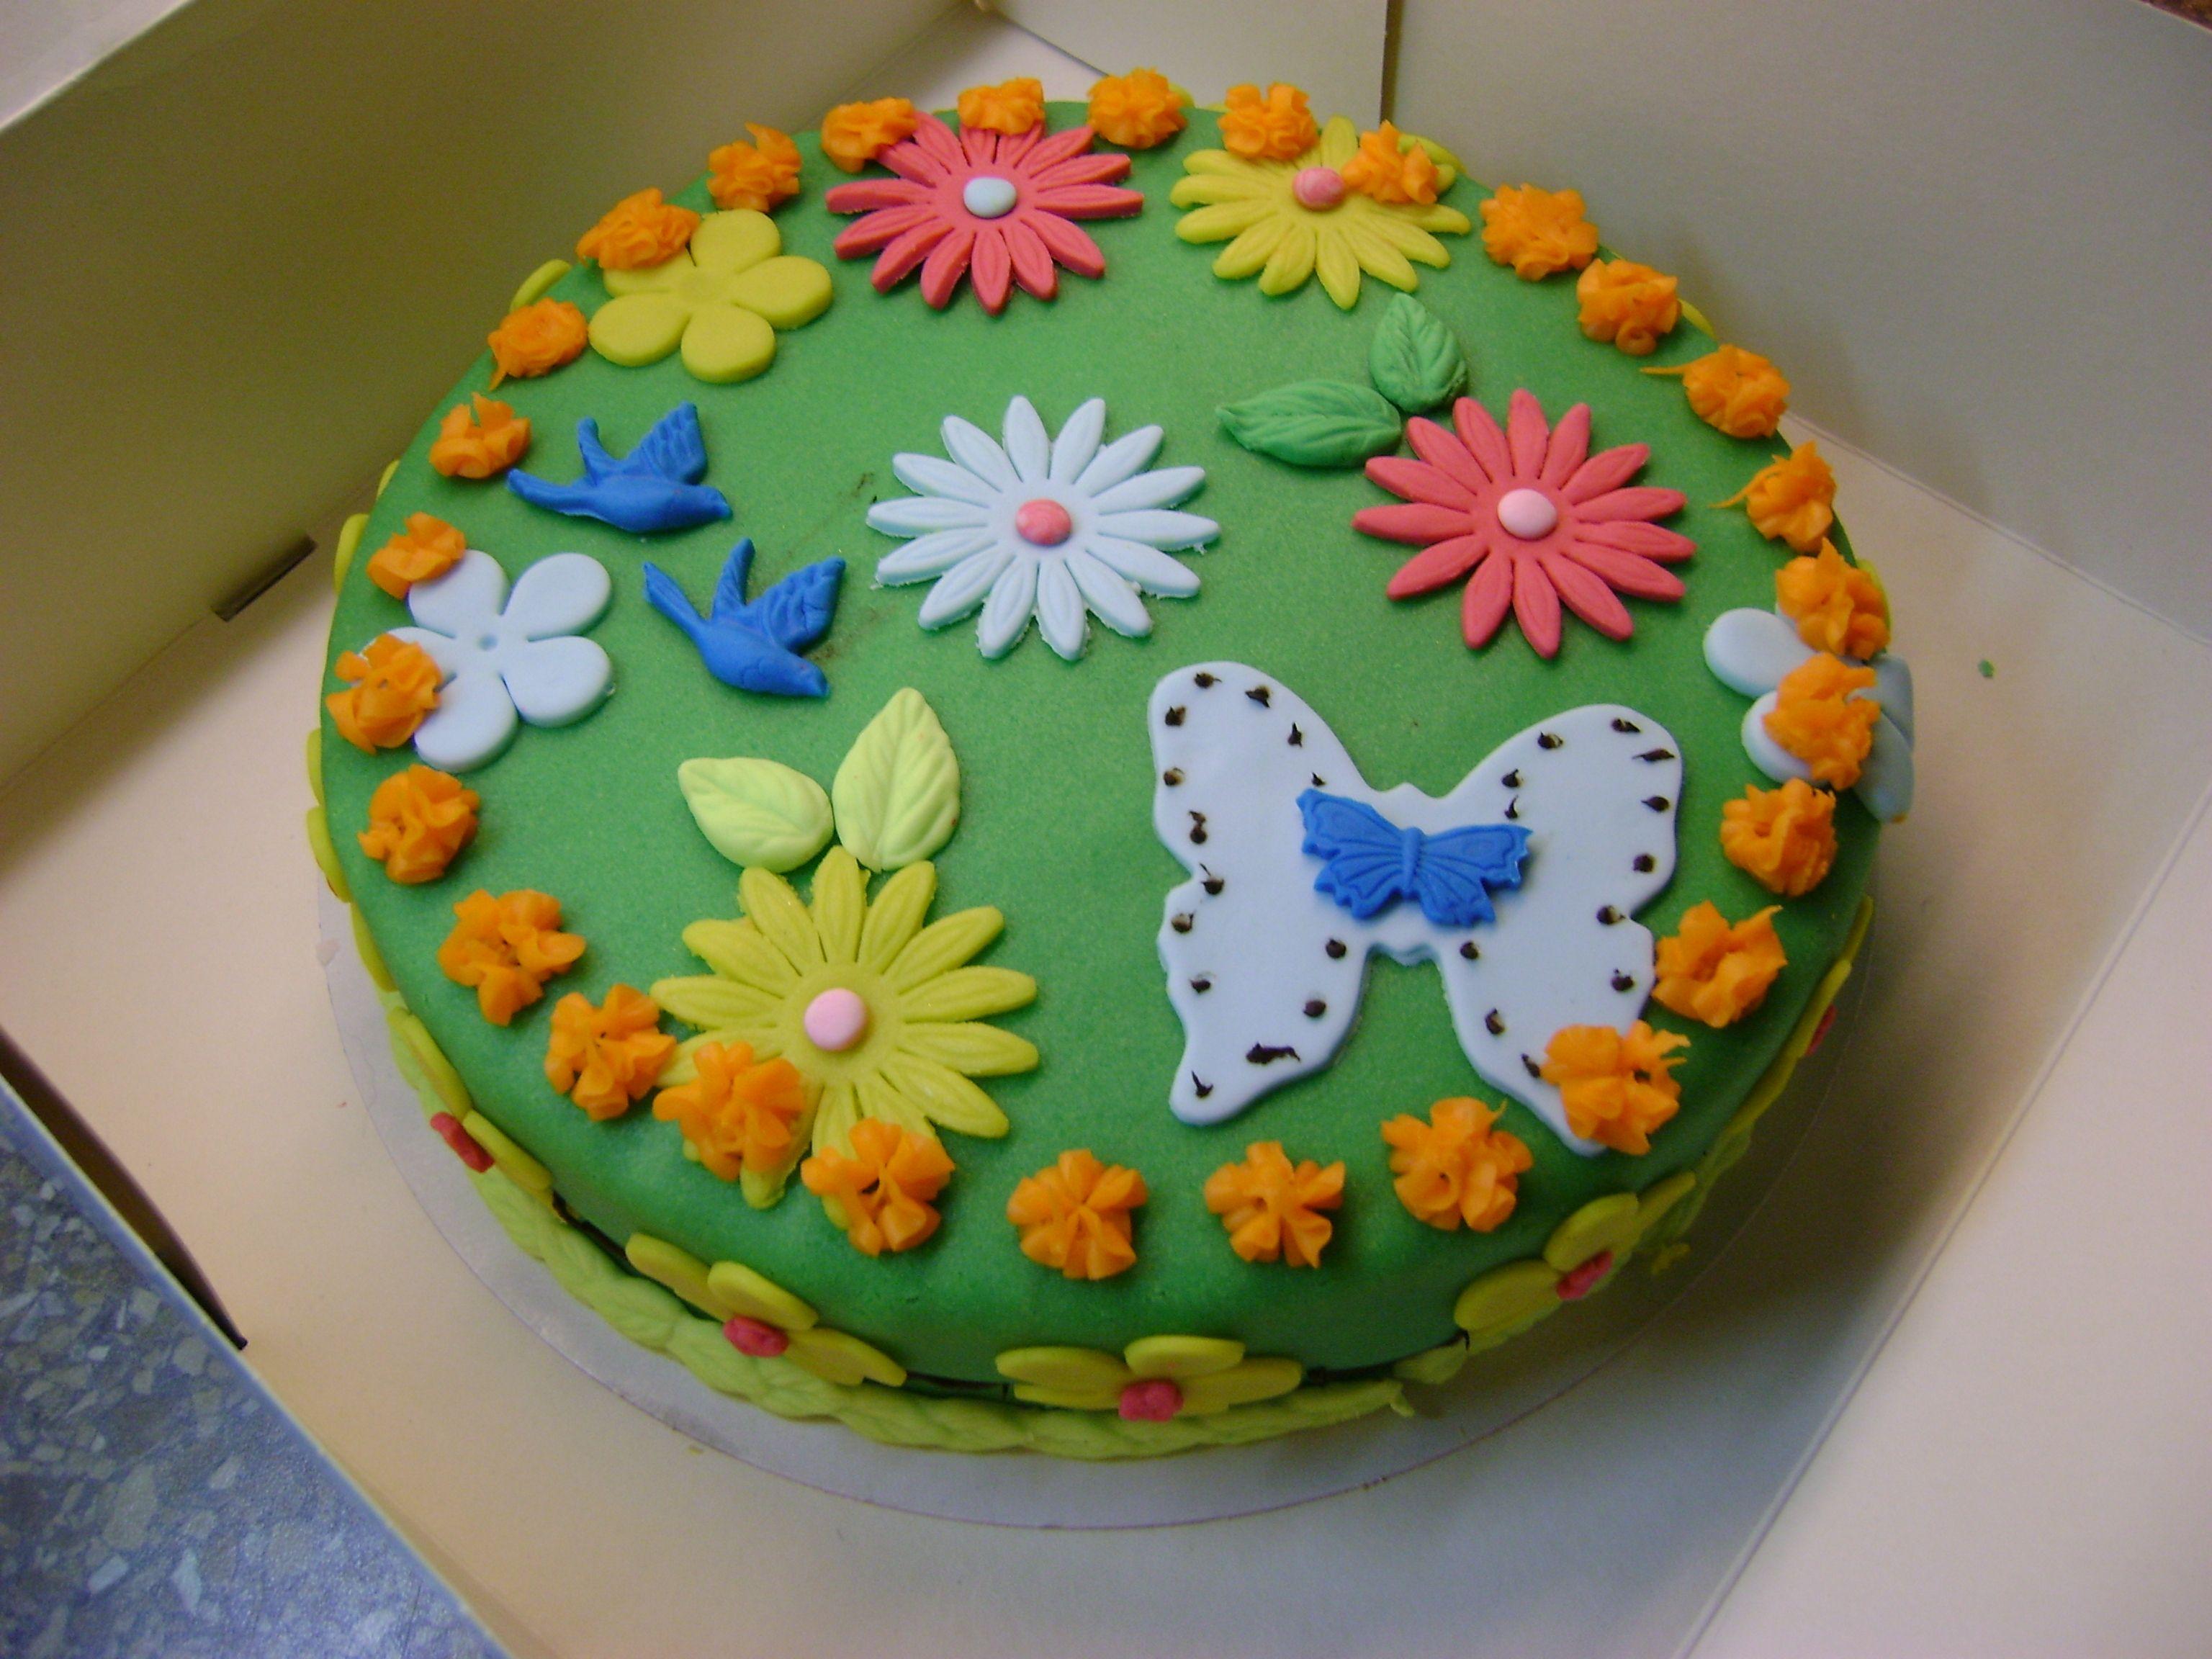 marzipan decorated cake